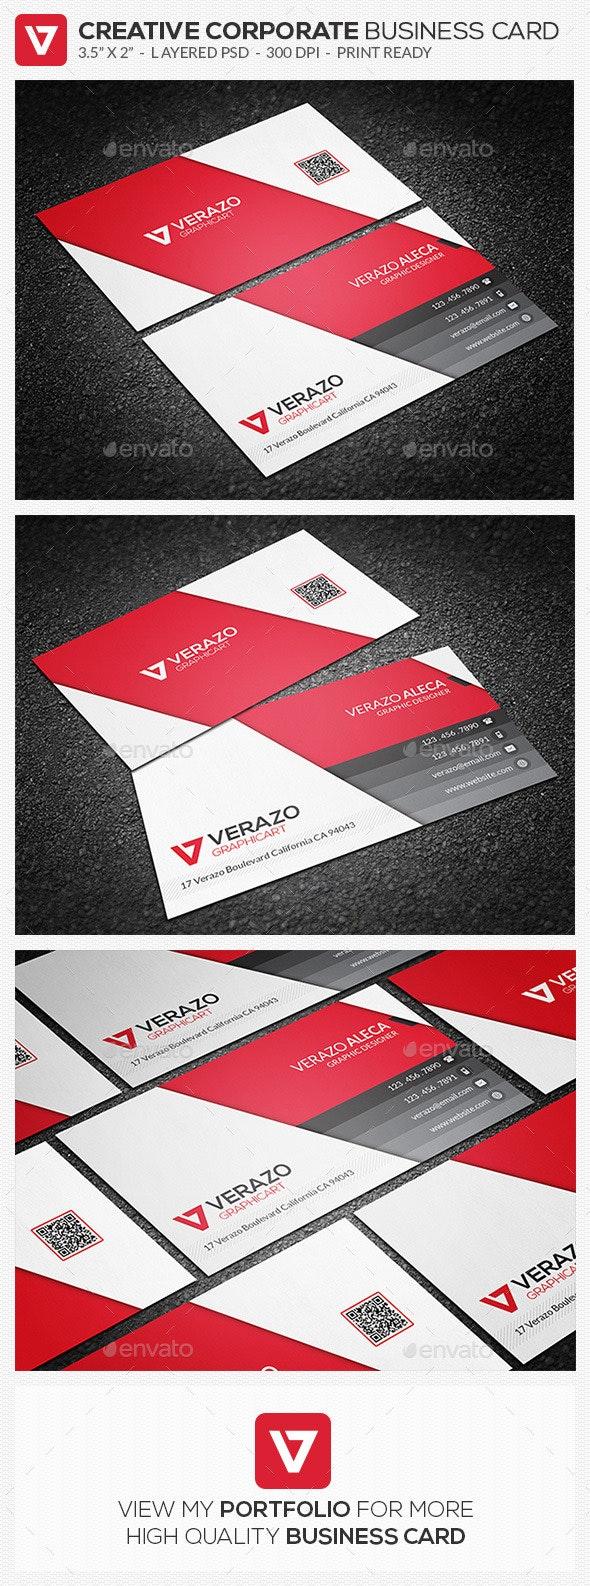 Creative & Modern Corporate Business Card 62 - Creative Business Cards